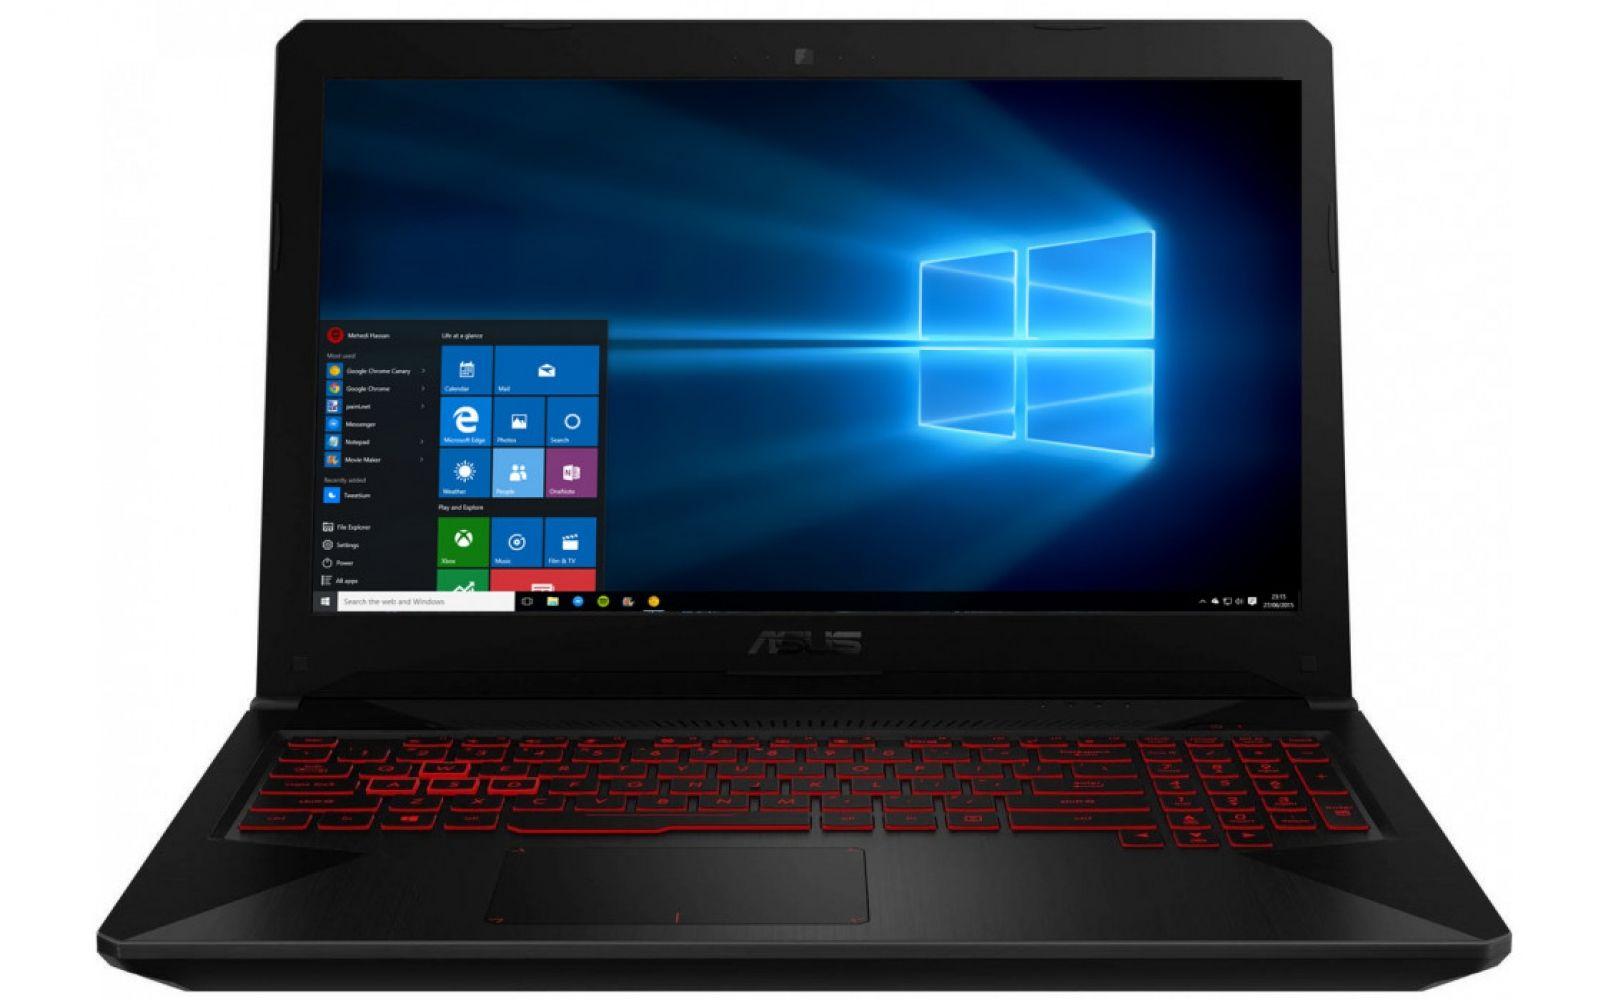 Купить Ноутбуки, Ноутбук ASUS TUF Gaming FX504GM-E4245T (90NR00Q2-M04880) Black/Red Pattern